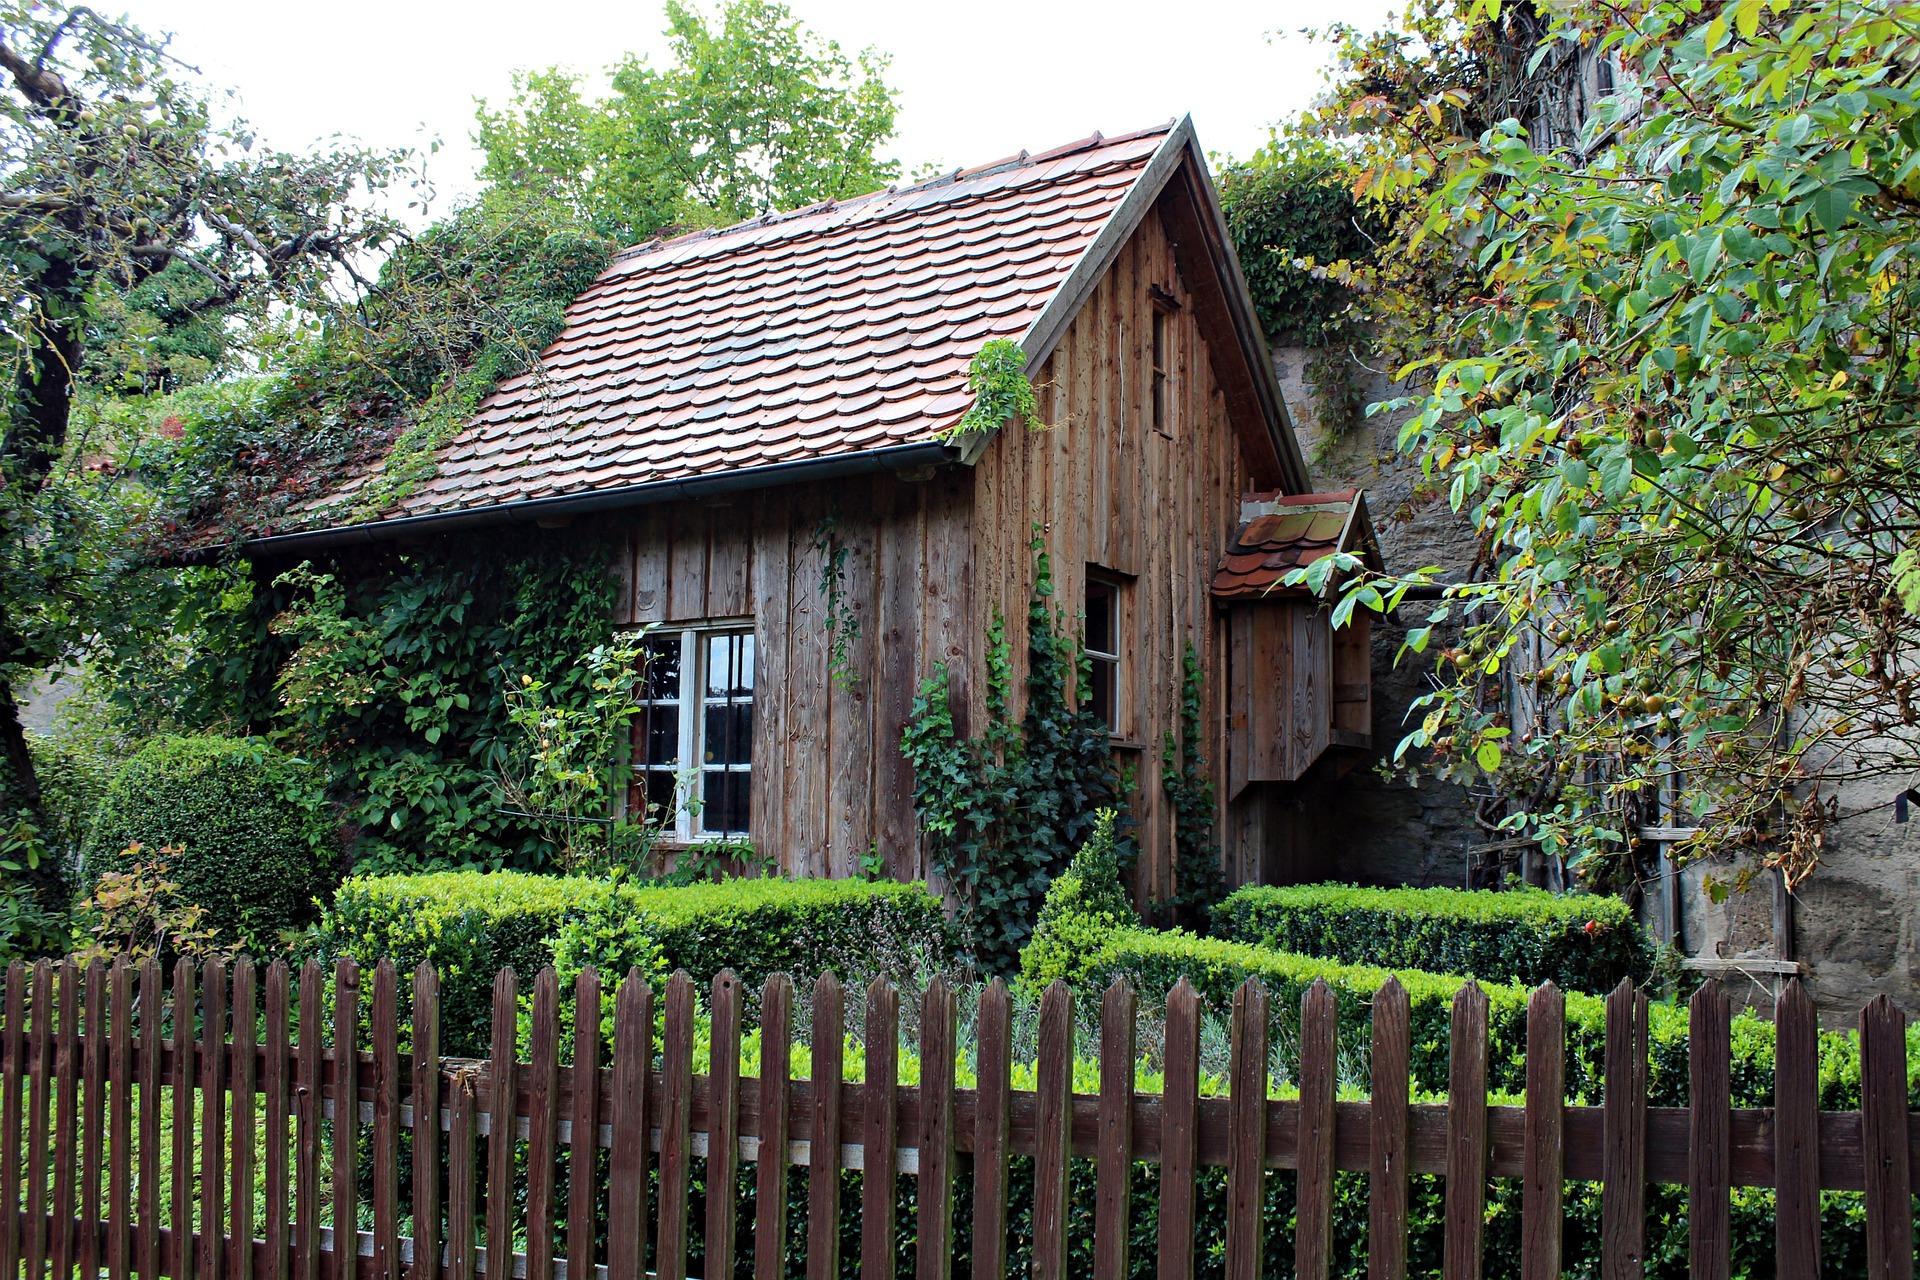 old-wooden-hut-456881_1920